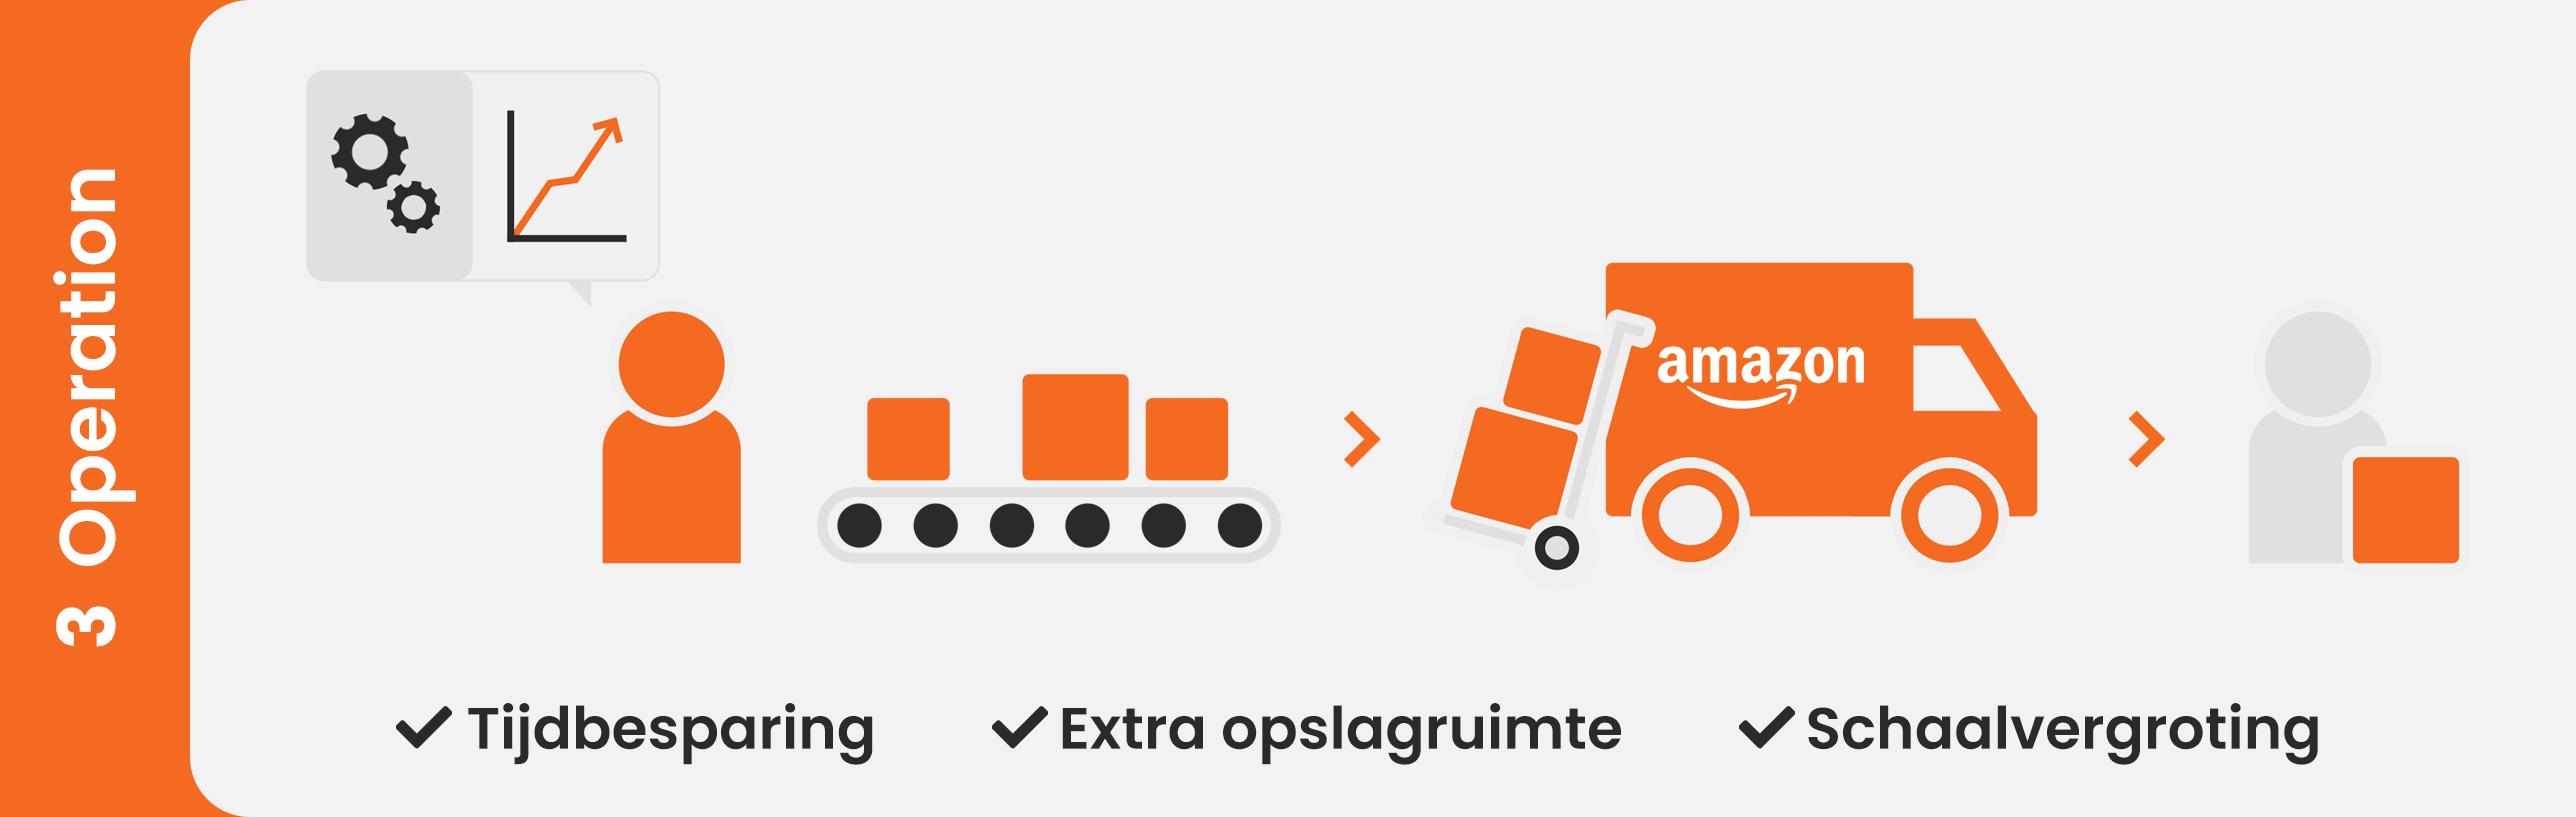 Operation Amazon, Fulfilment by Amazon, Fba